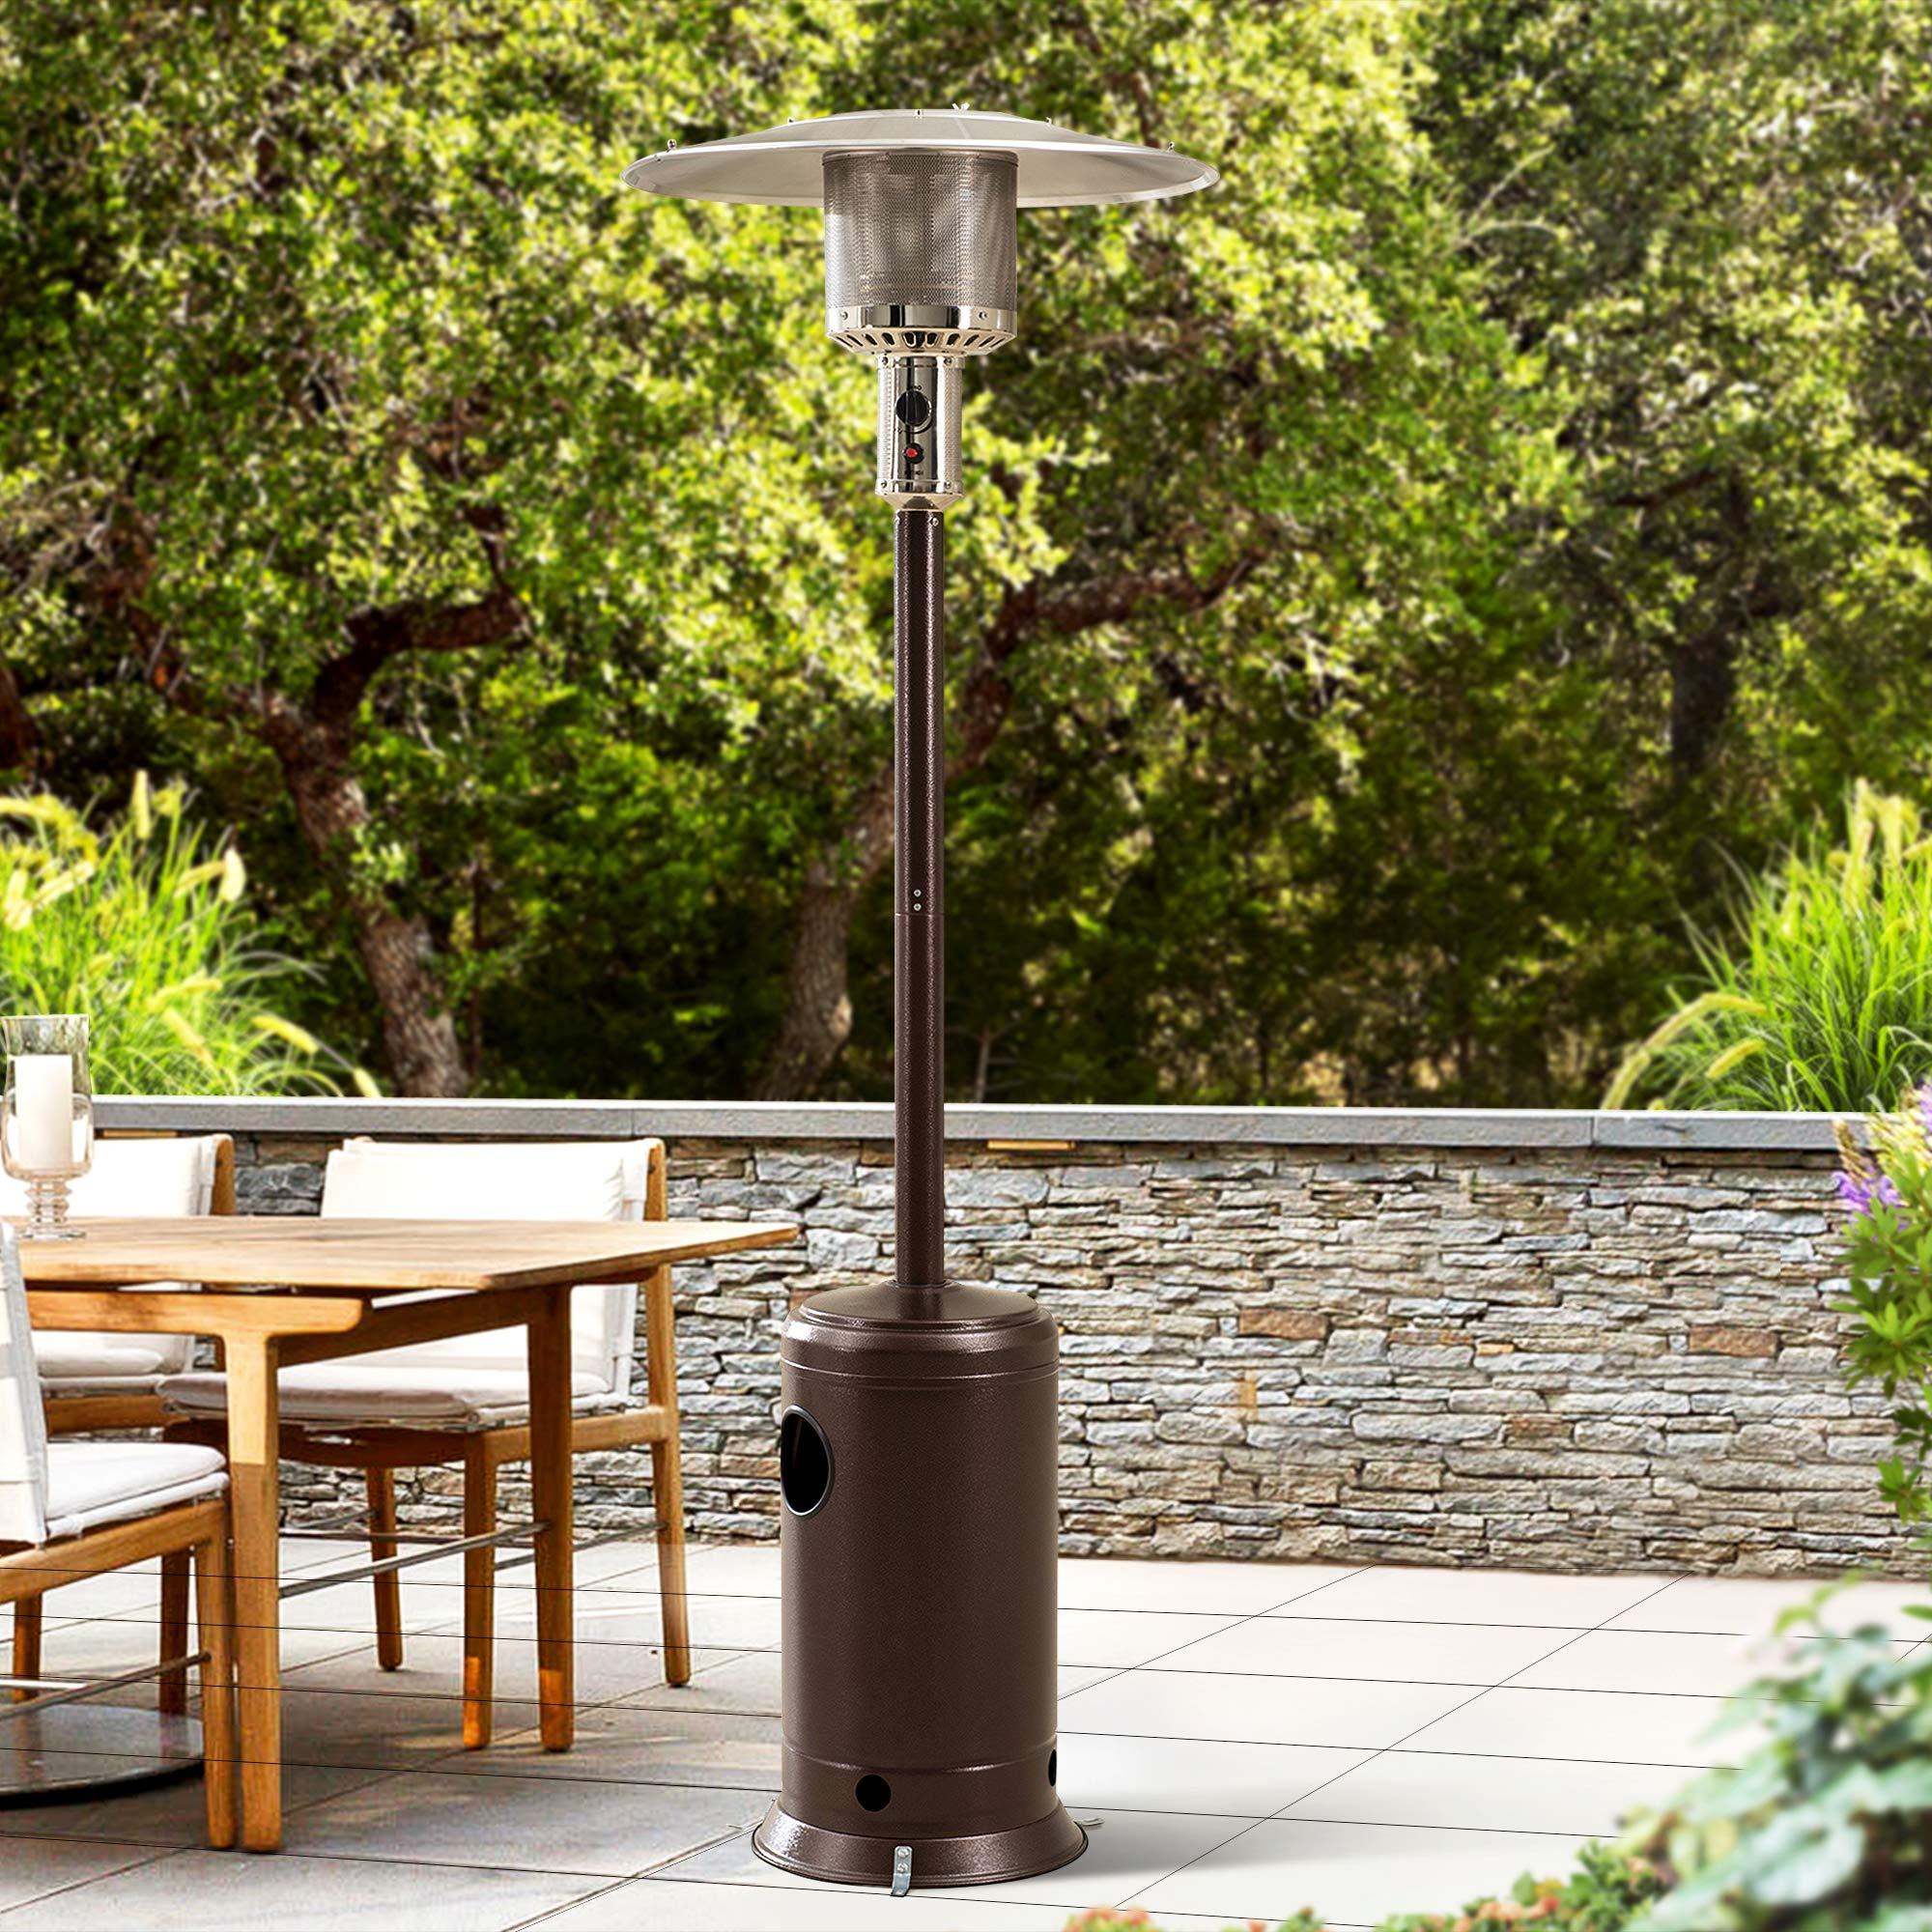 Sponsored Ad - Sunjoy 47,000 BTU Avanti Propane Heater, Bronze